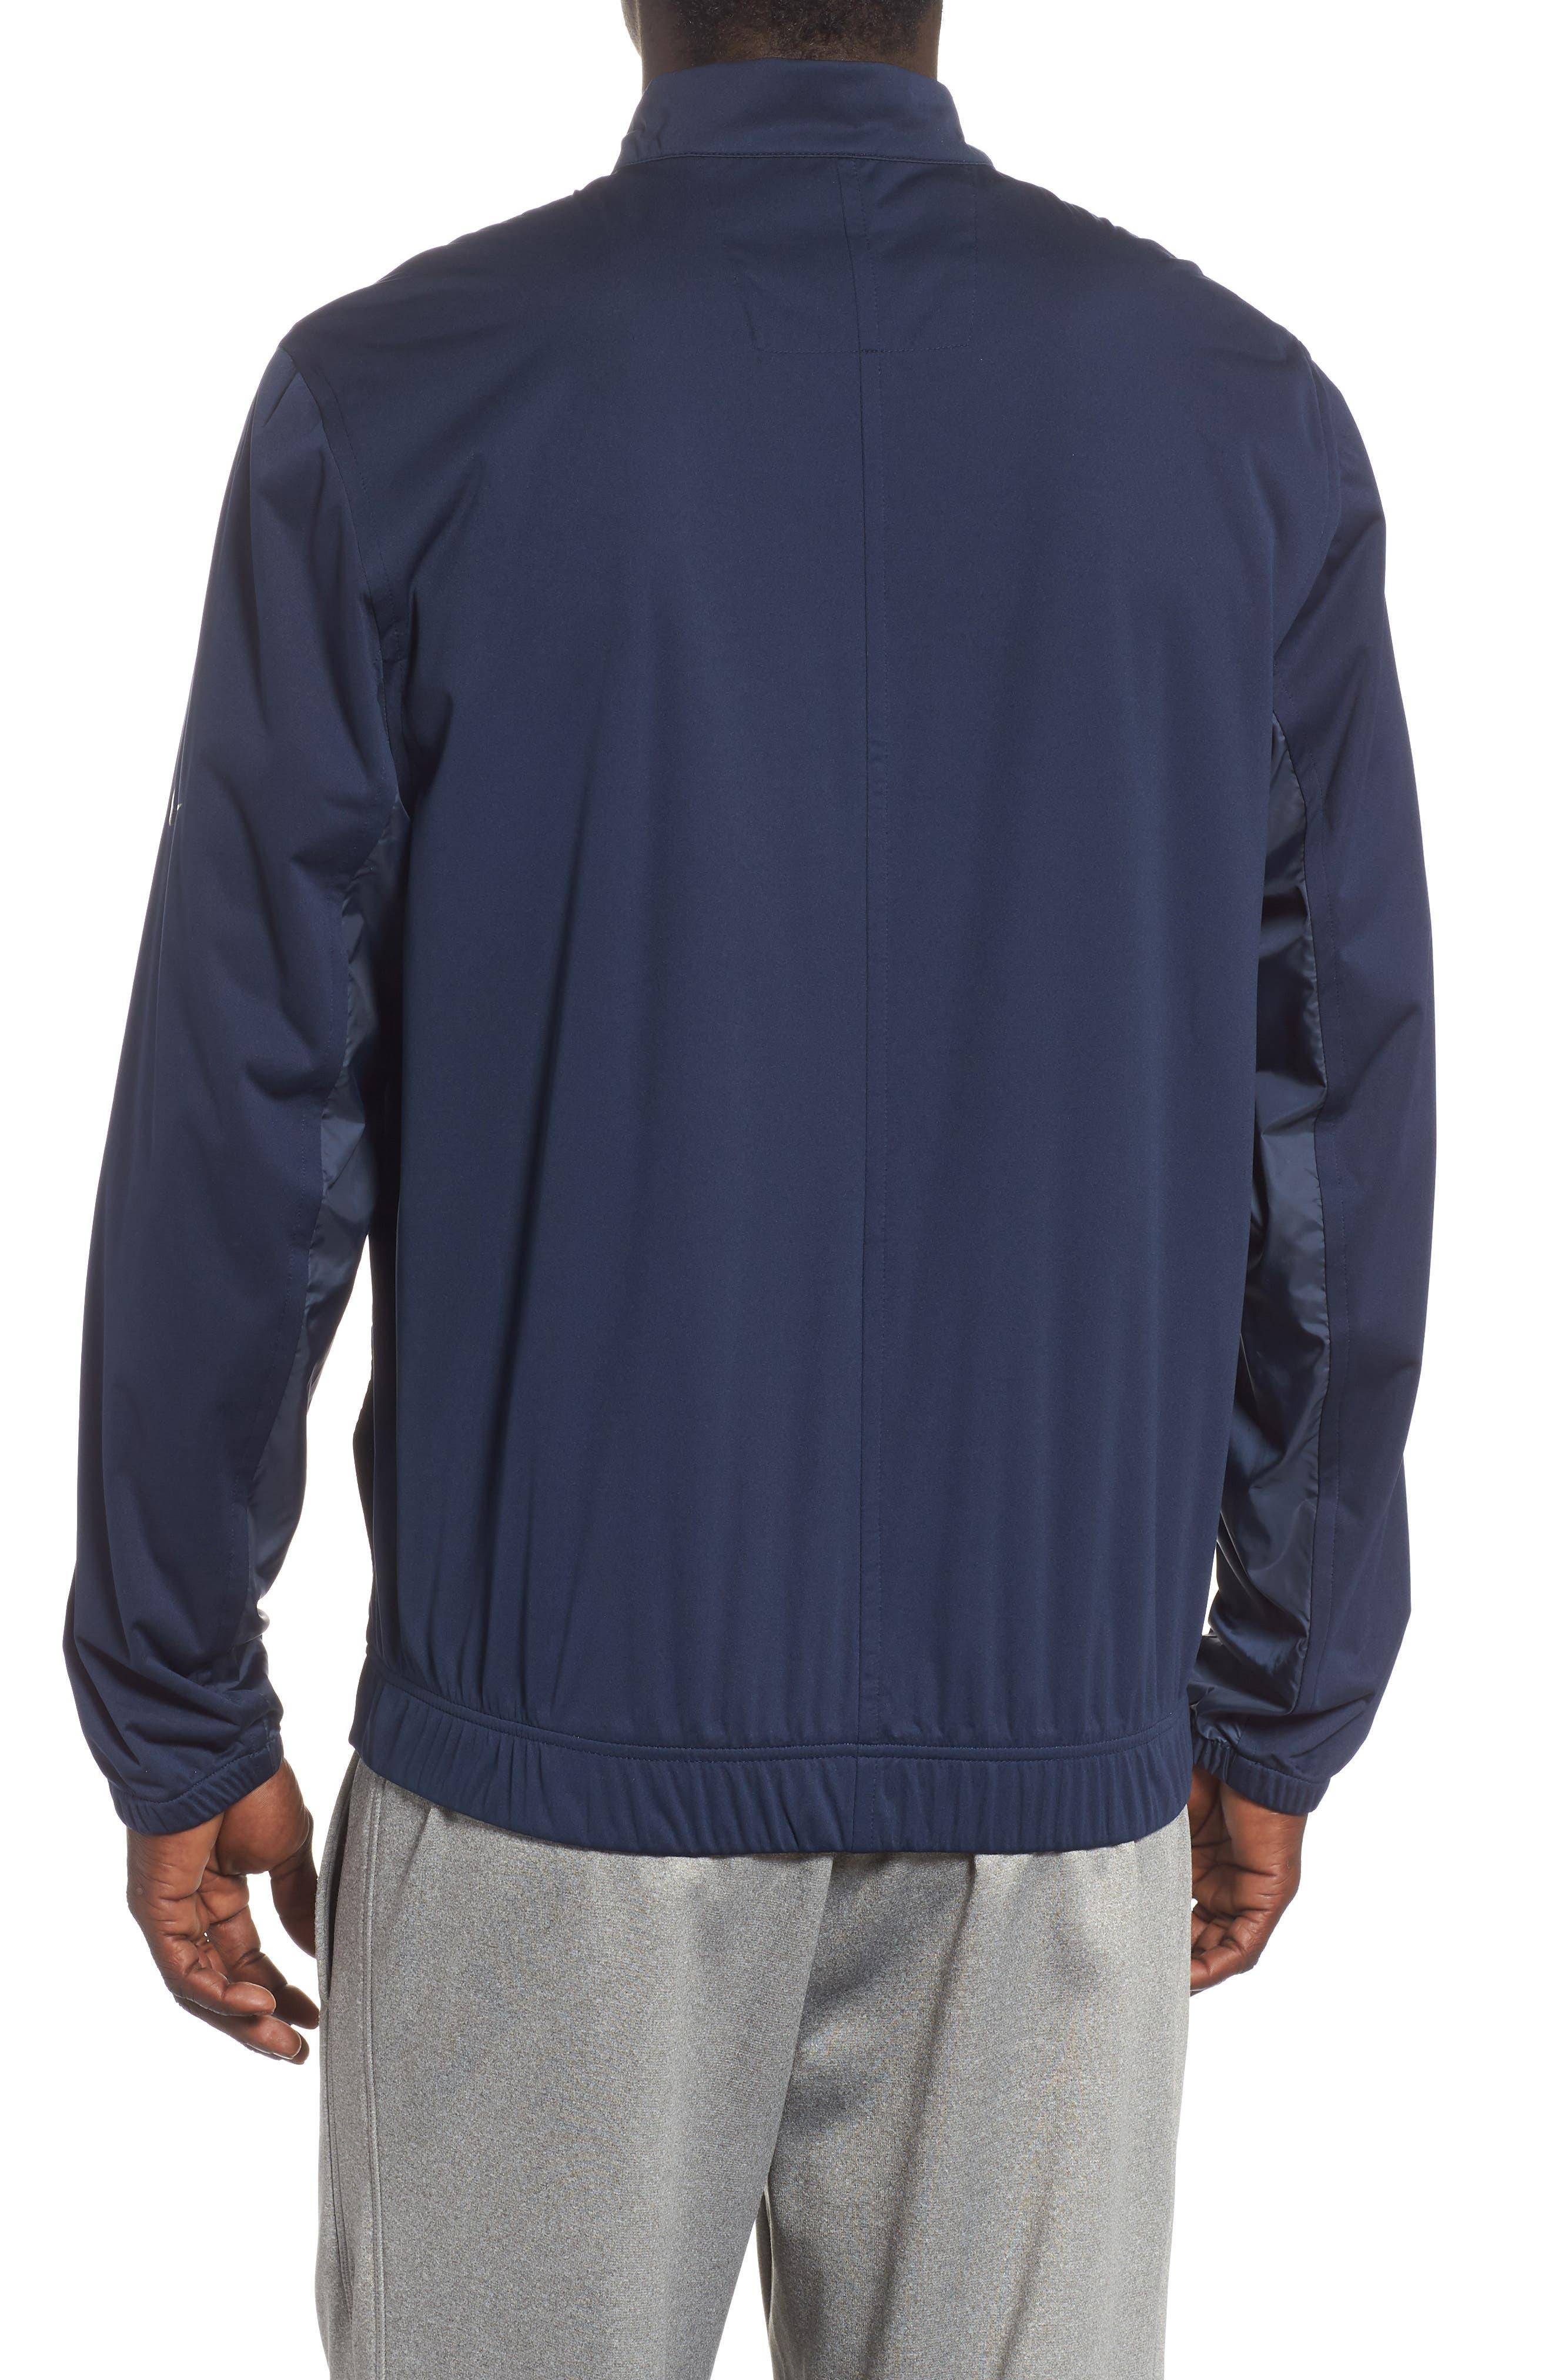 Shield Core Zip Golf Jacket,                             Alternate thumbnail 2, color,                             OBSIDIAN/ OBSIDIAN/ BLACK